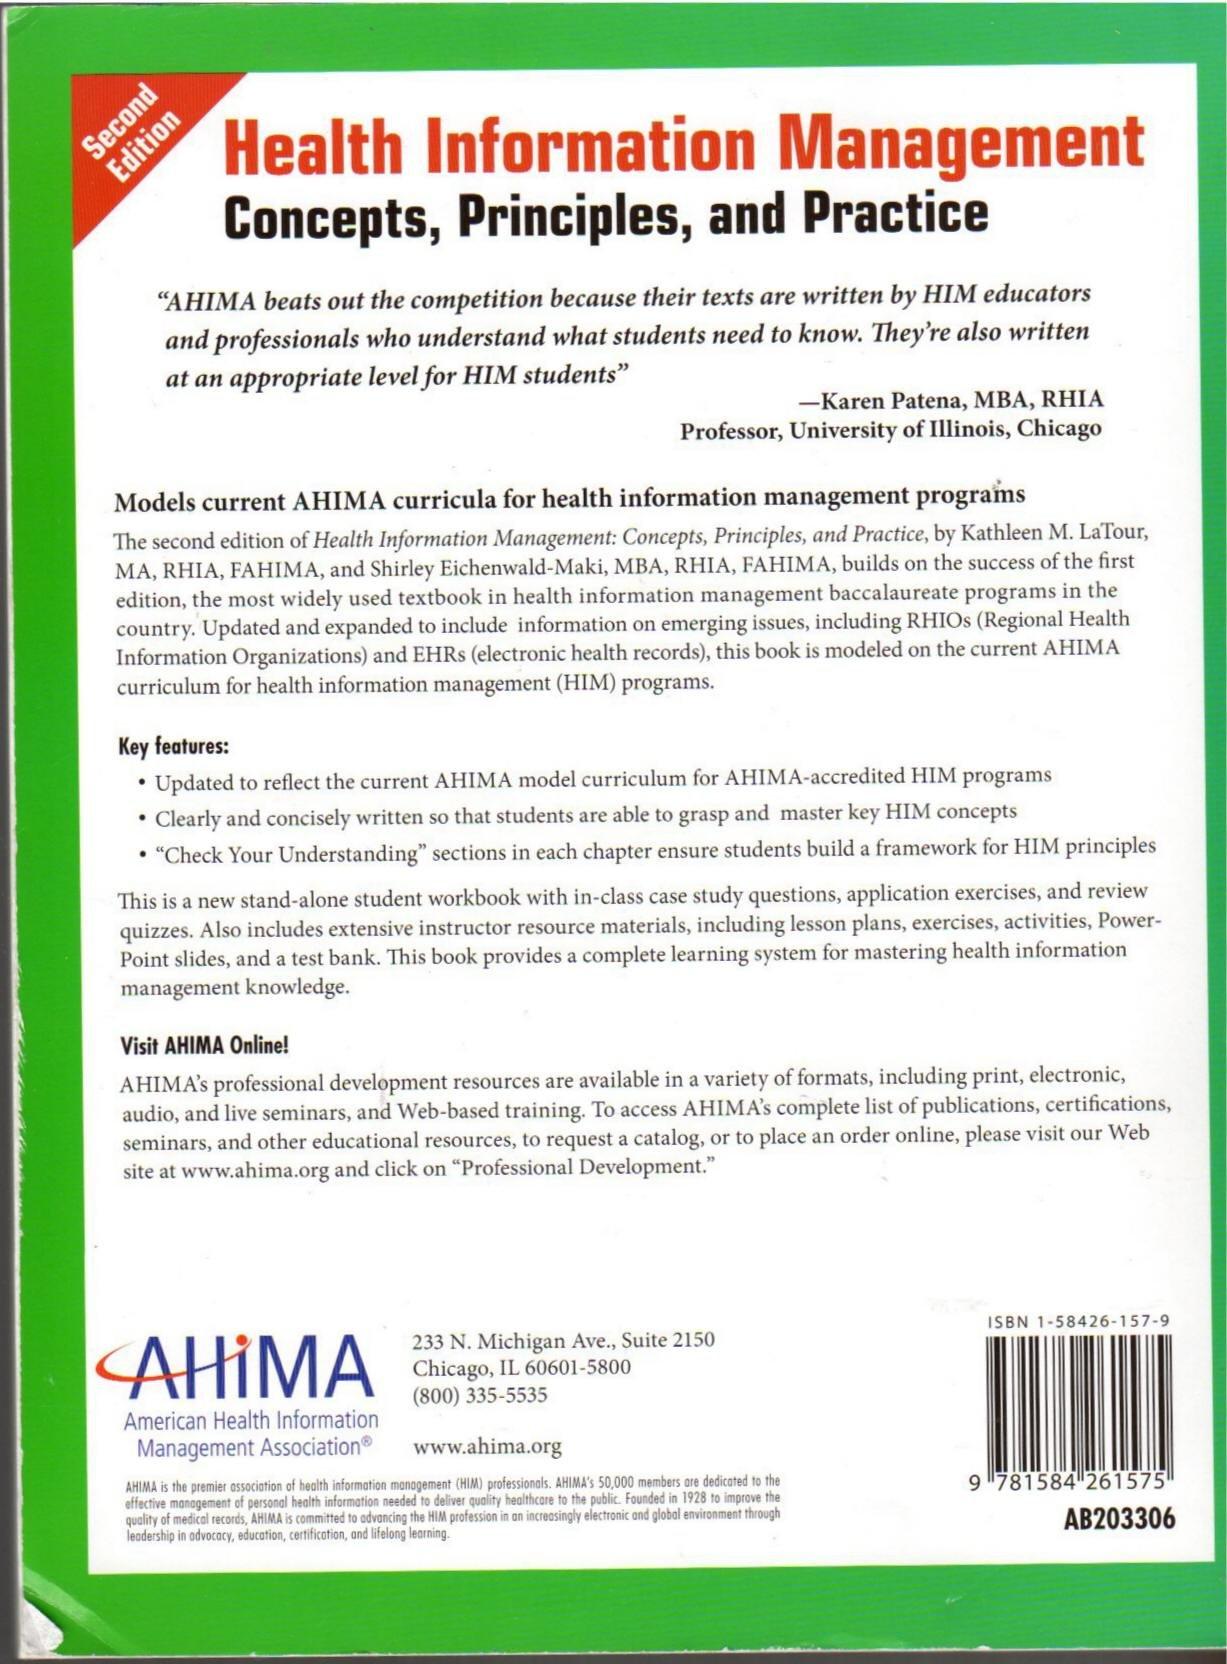 Health information management concept workbook 2nd 06 edition health information management concept workbook 2nd 06 edition kathleen m latour 9781584261575 amazon books xflitez Choice Image